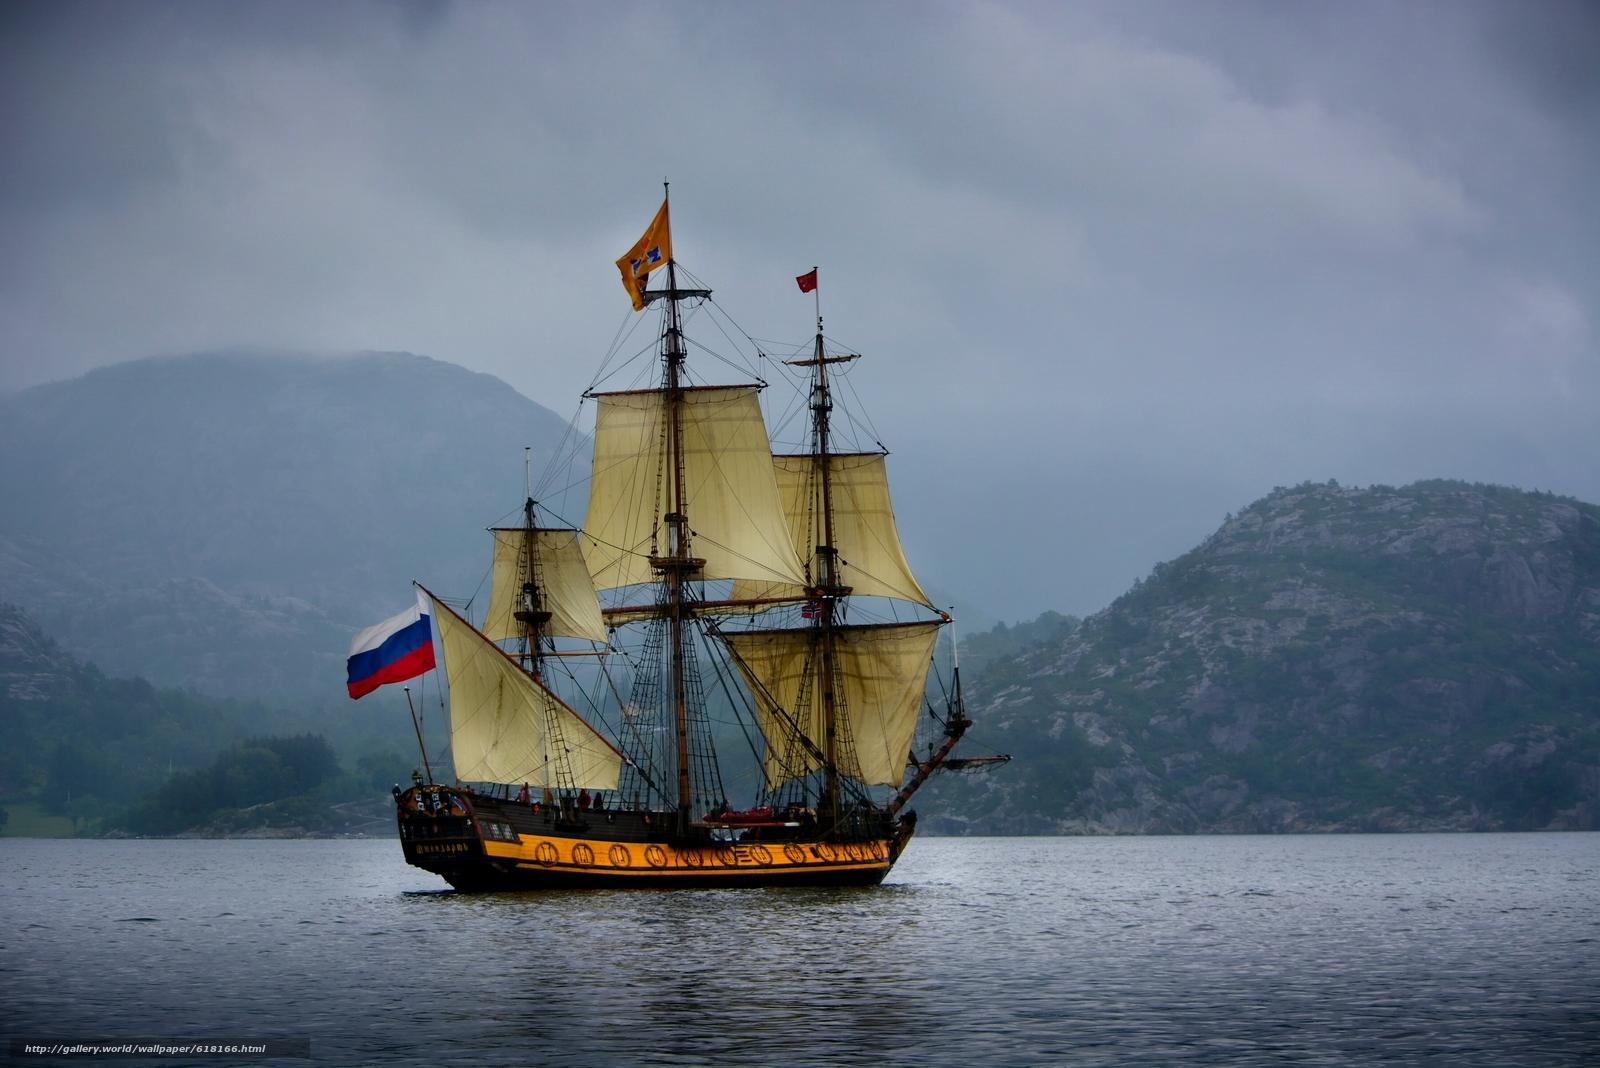 Norway, Norwegian Sea, Норвегия, Норвежское море, фрегат Штандарт, фрегат, Штандарт, парусник, море, горы